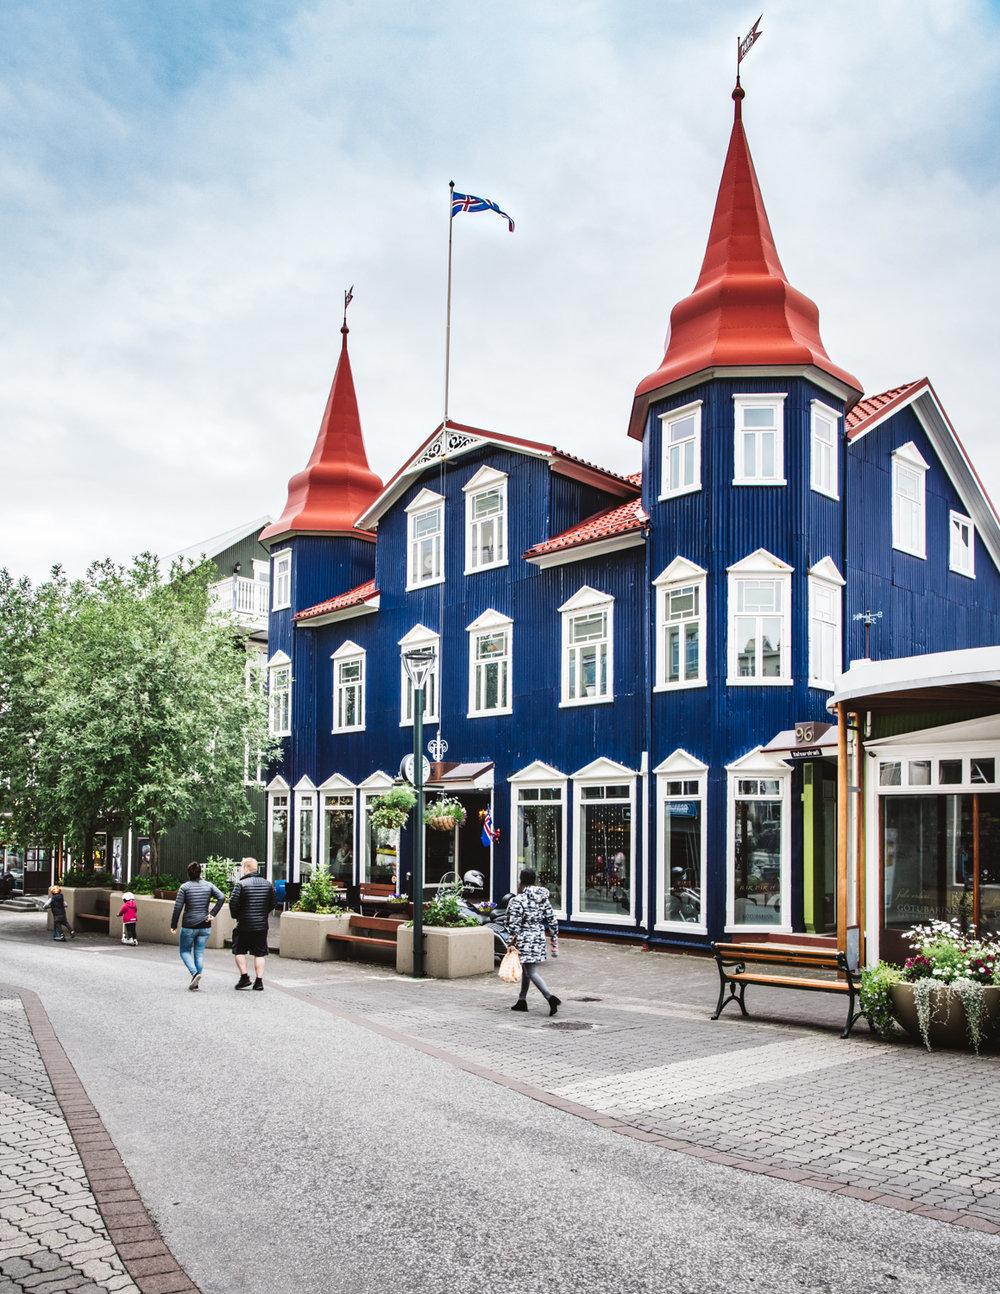 North-Iceland_4_c Nanna Dis 2018 (1 of 1).jpg